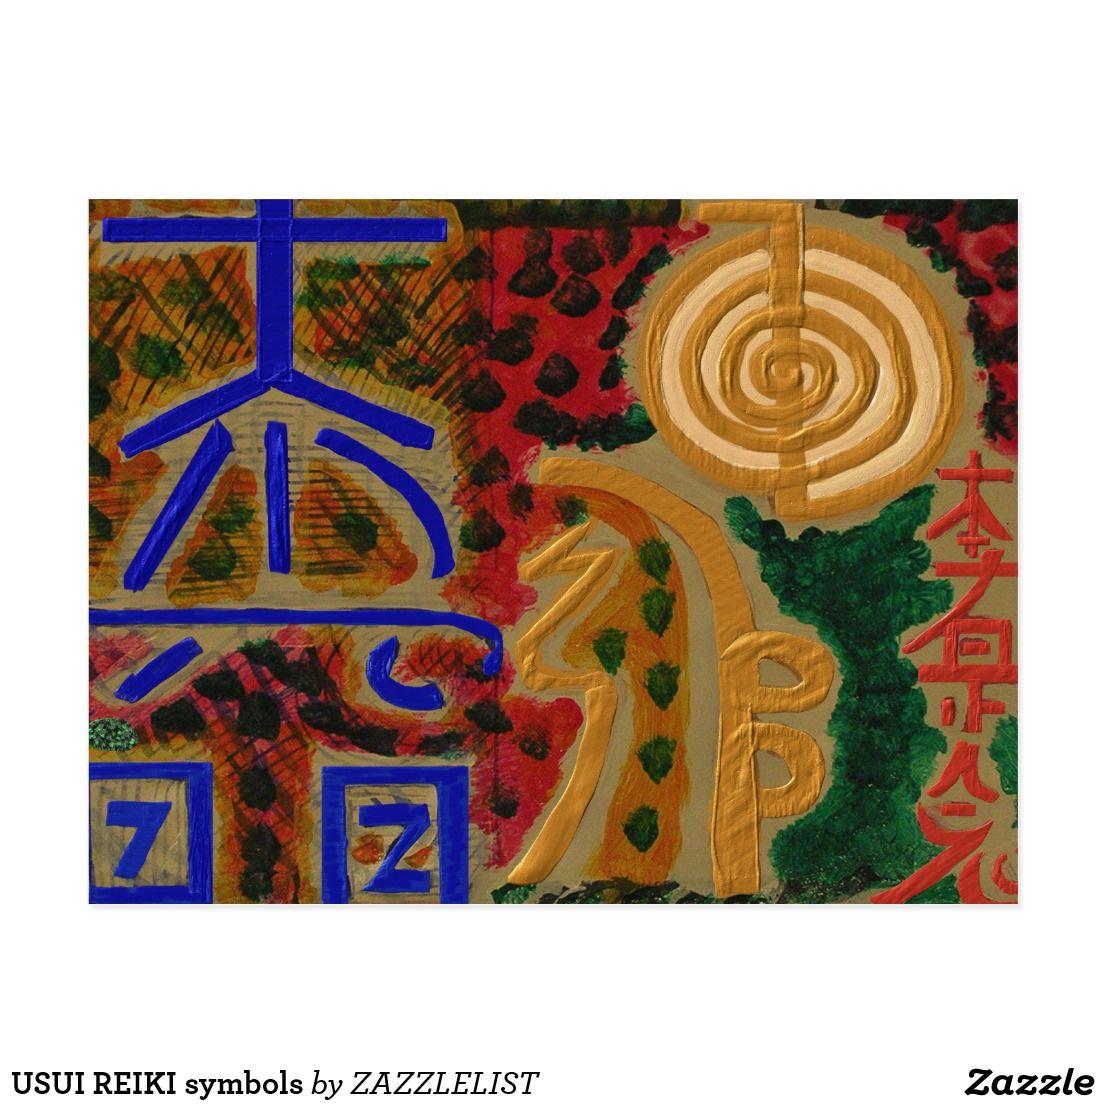 Usui reiki symbols postcard 101 zazzle pro favorite stores usui reiki symbols postcard biocorpaavc